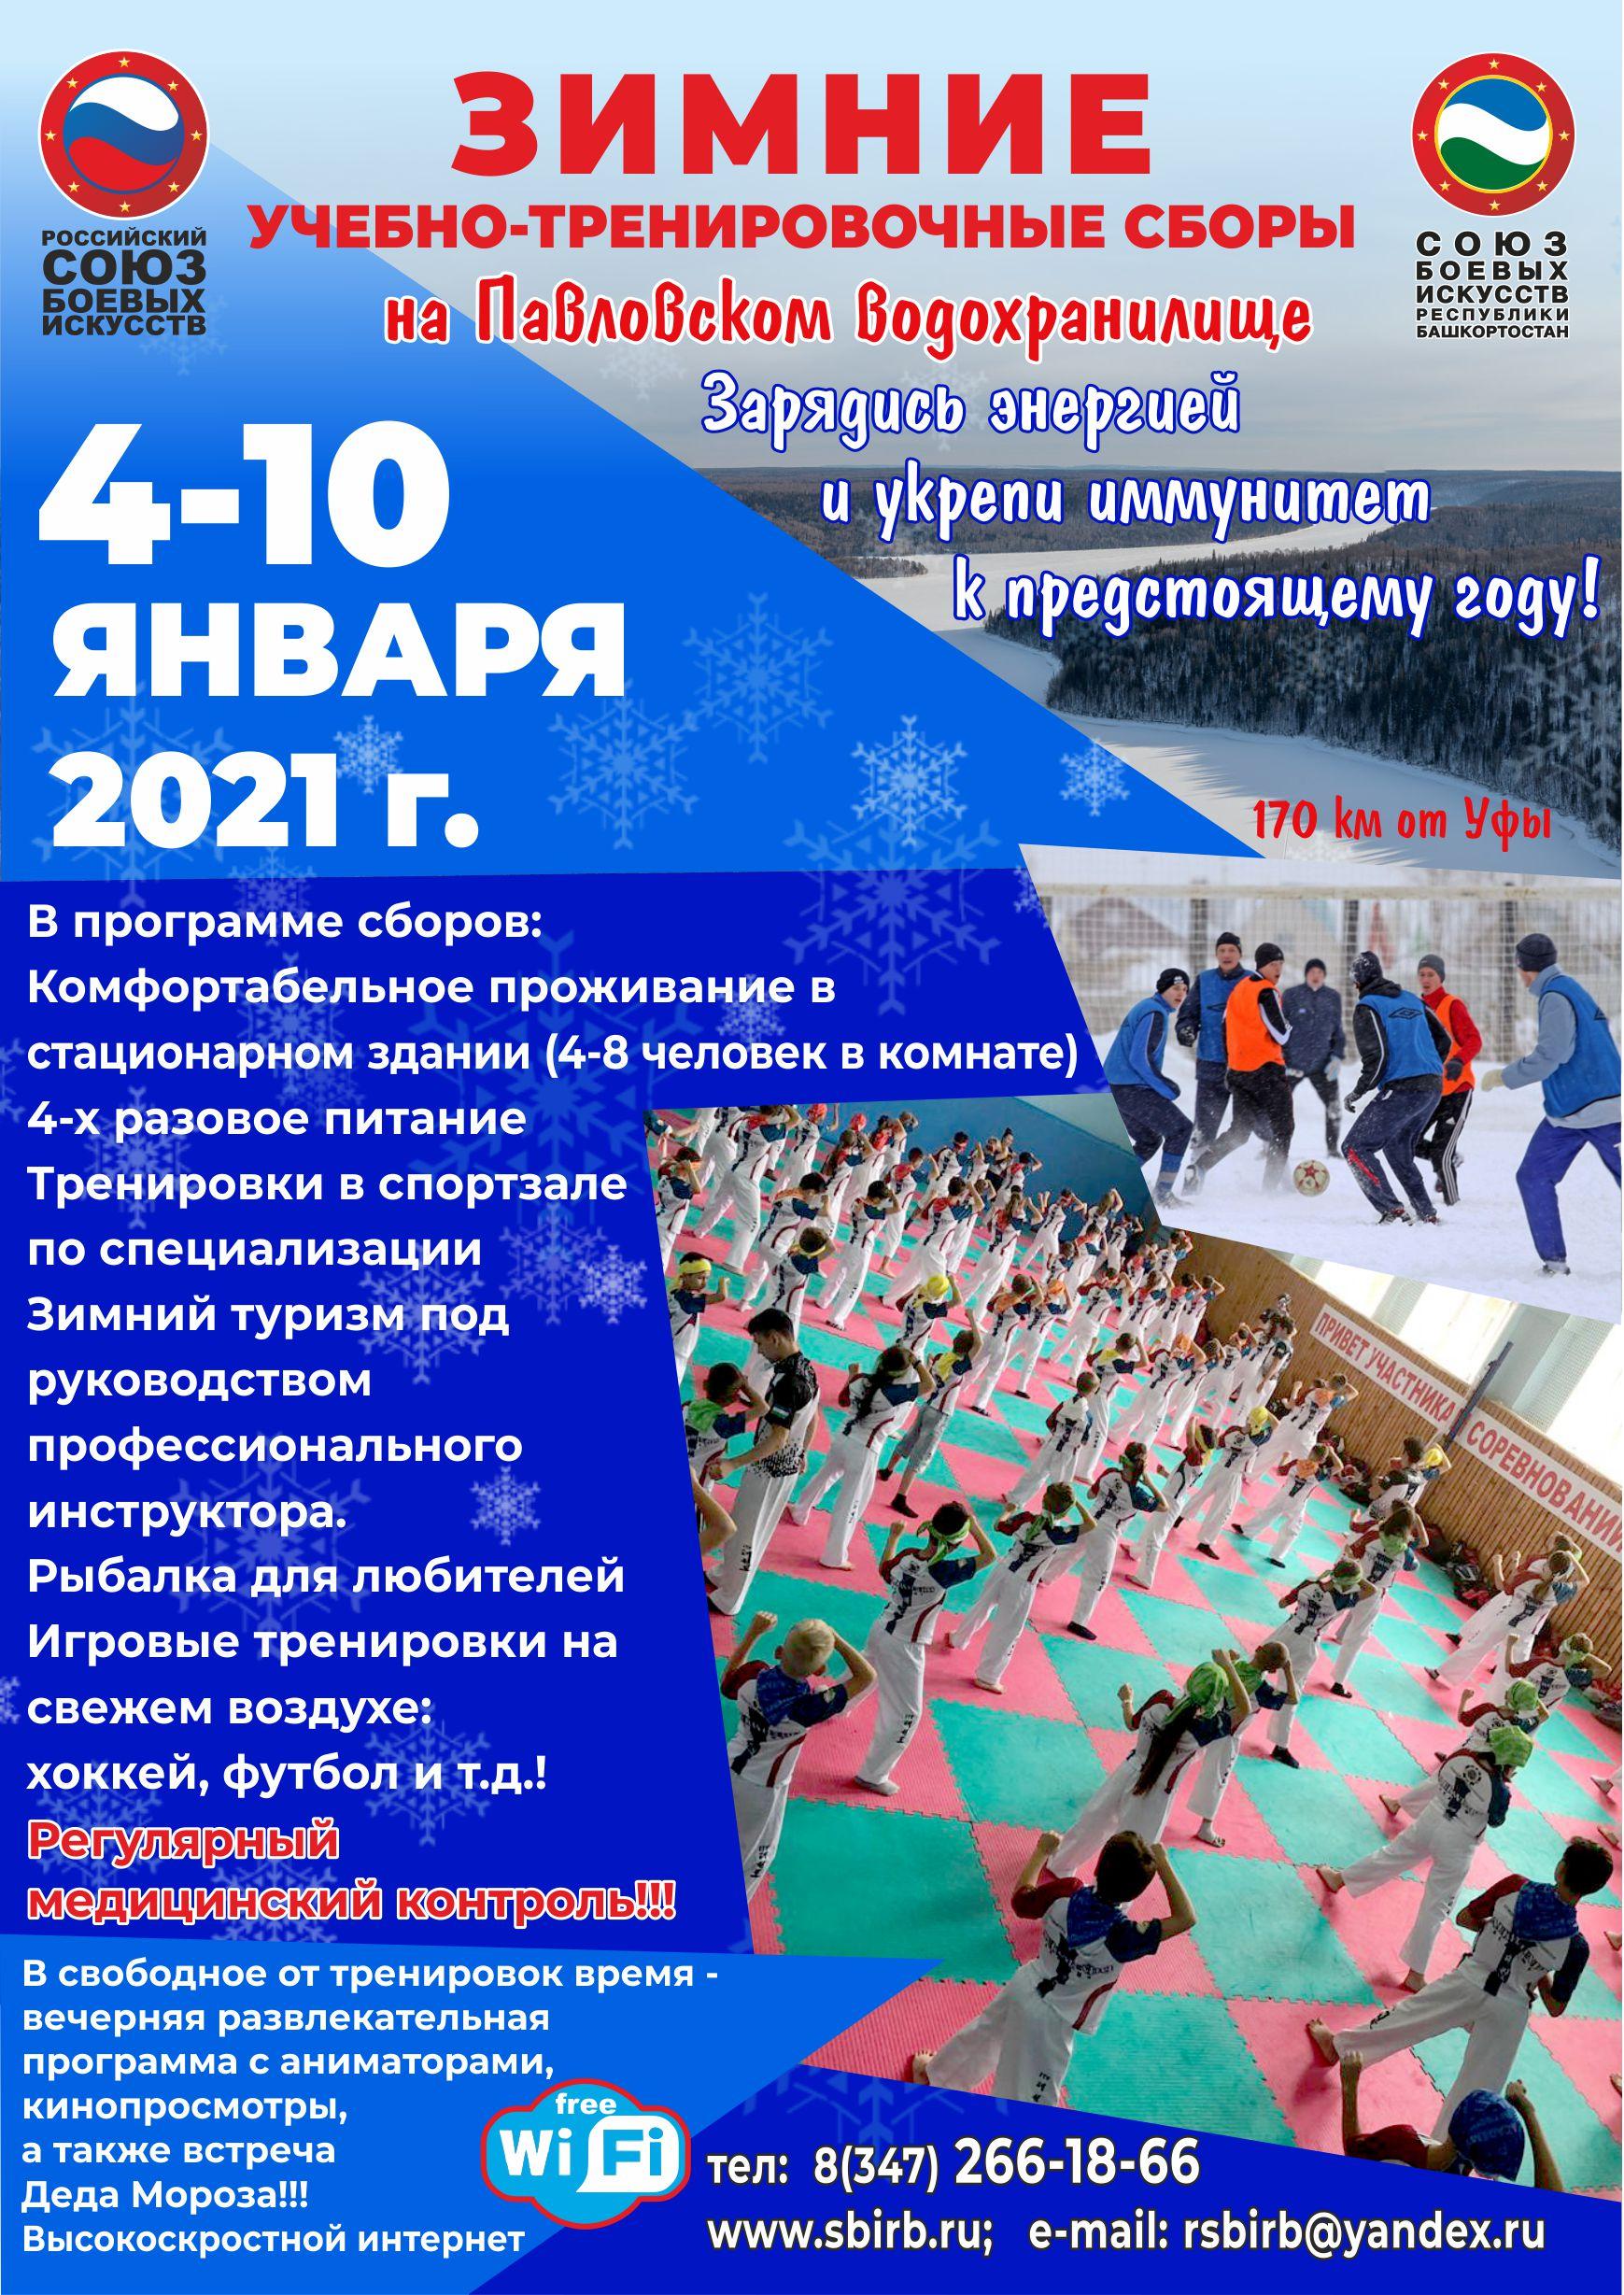 http://sbirb.combatsd.ru/images/upload/Афиша_сборы_зима.jpg